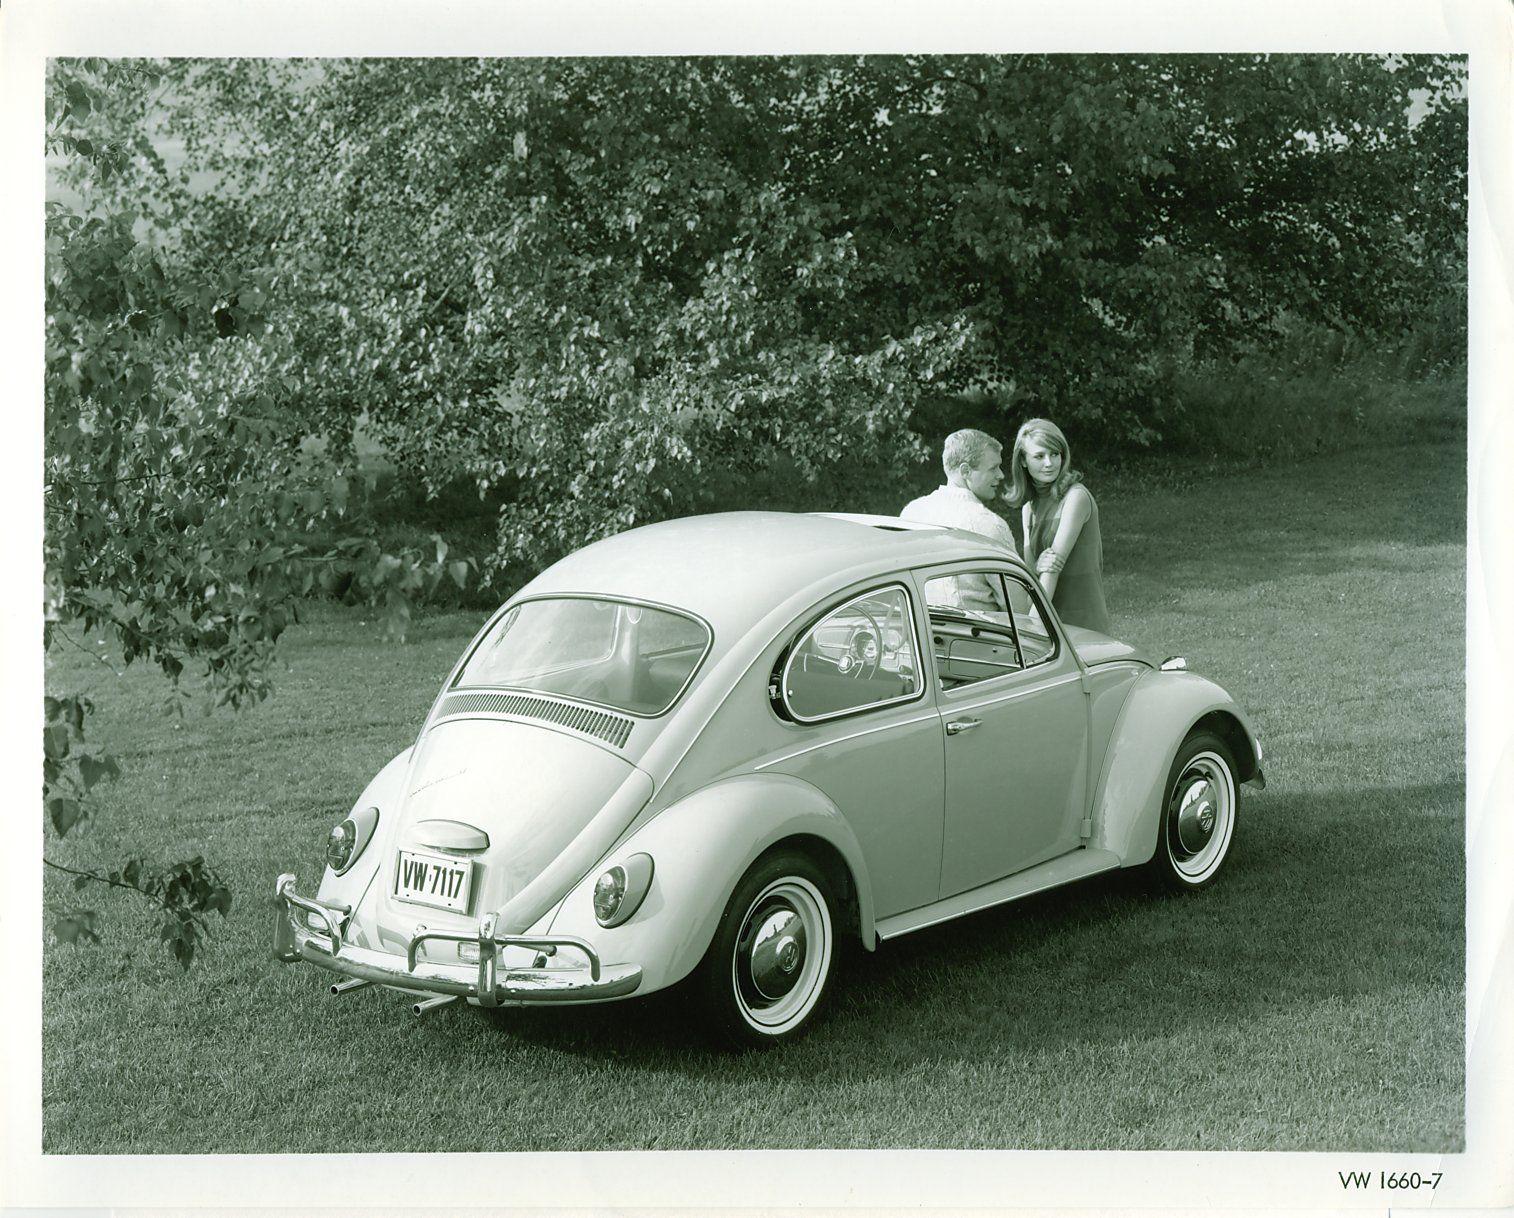 Original Press Photos 1967 Vw Beetle Vw Beetles Vw Käfer Classic Volkswagen